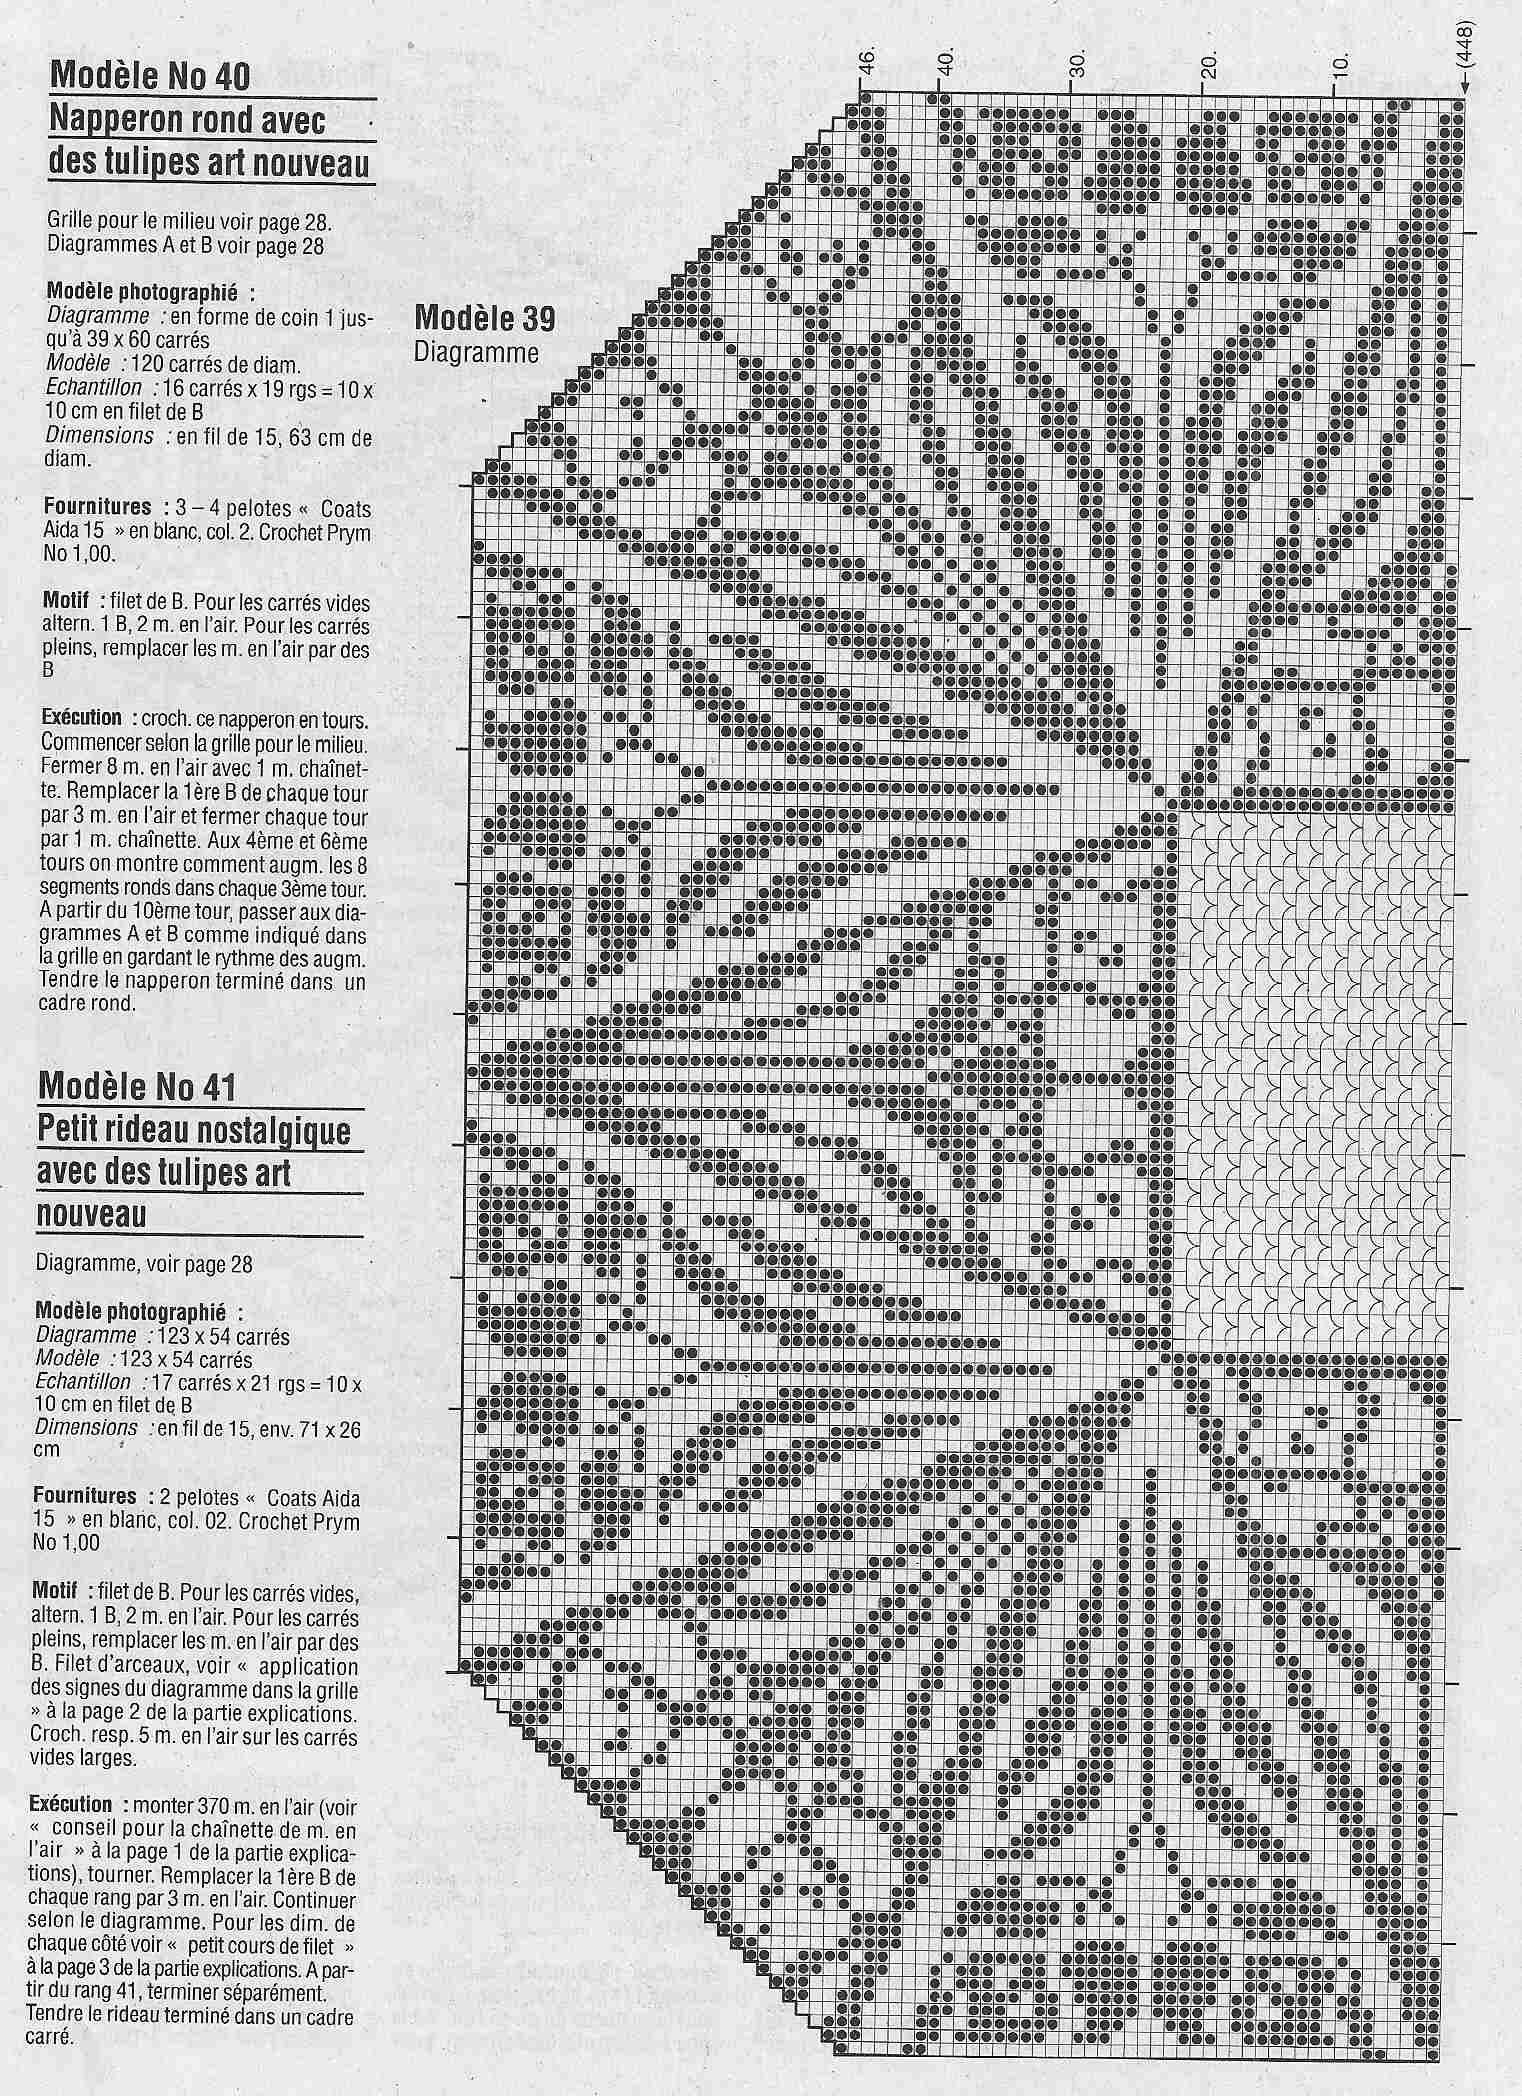 imgbox - fast, simple image host | Vintage crochet tablecloth ...